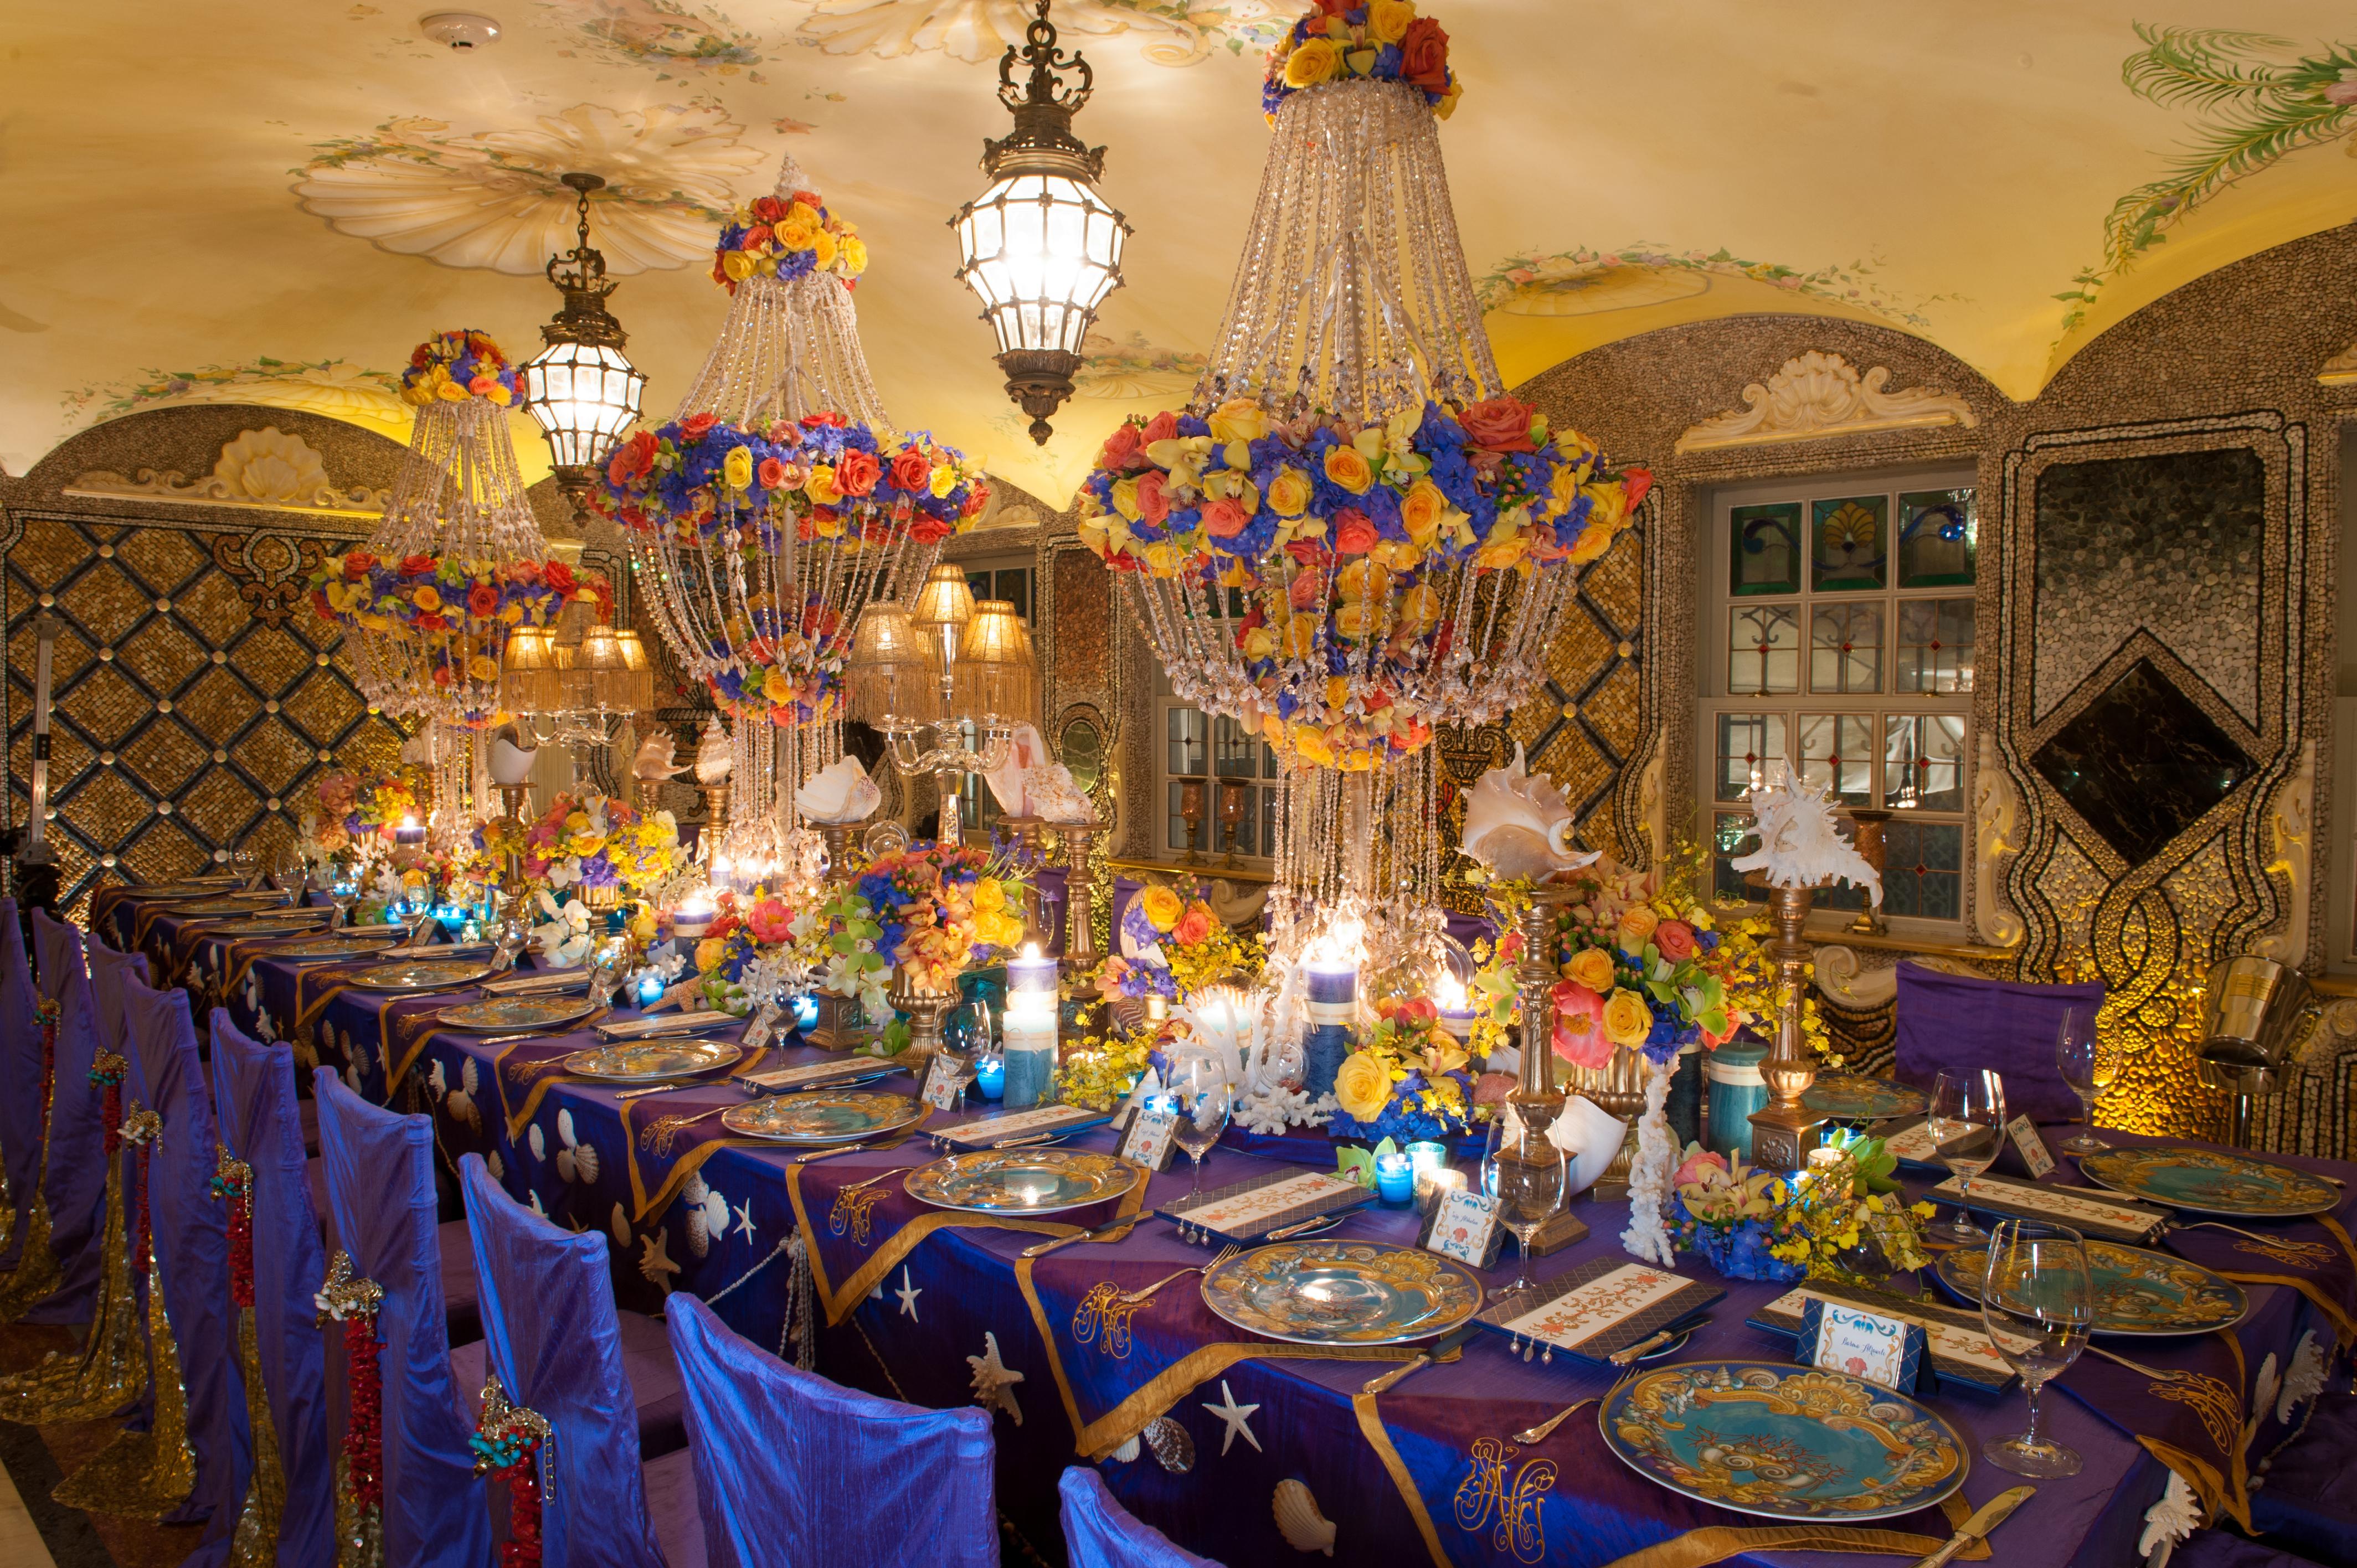 Miami Birthday Party - Alyson Fox, Levine Fox Events